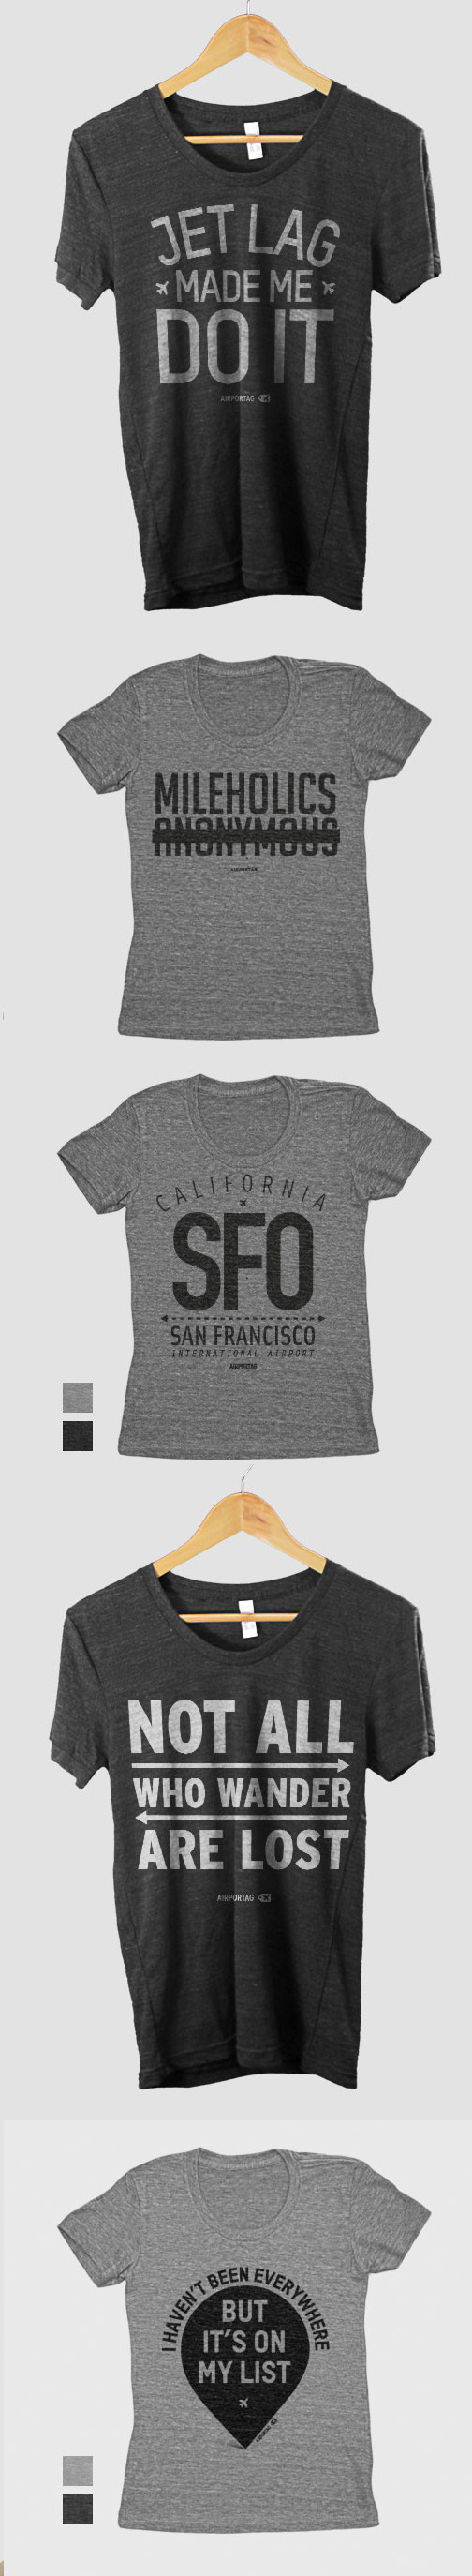 Black light t shirt ideas - Travel Quote T Shirts